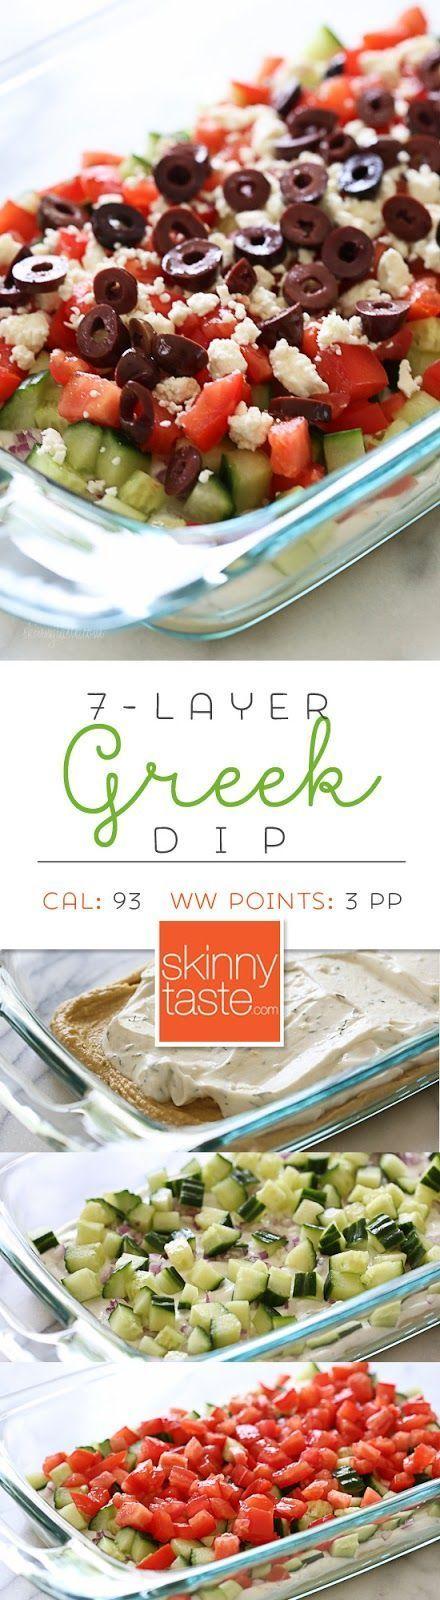 Entertainment ideas: Greek 7 Layer Dip – a healthy dip for backyard parties or summer potlucks!